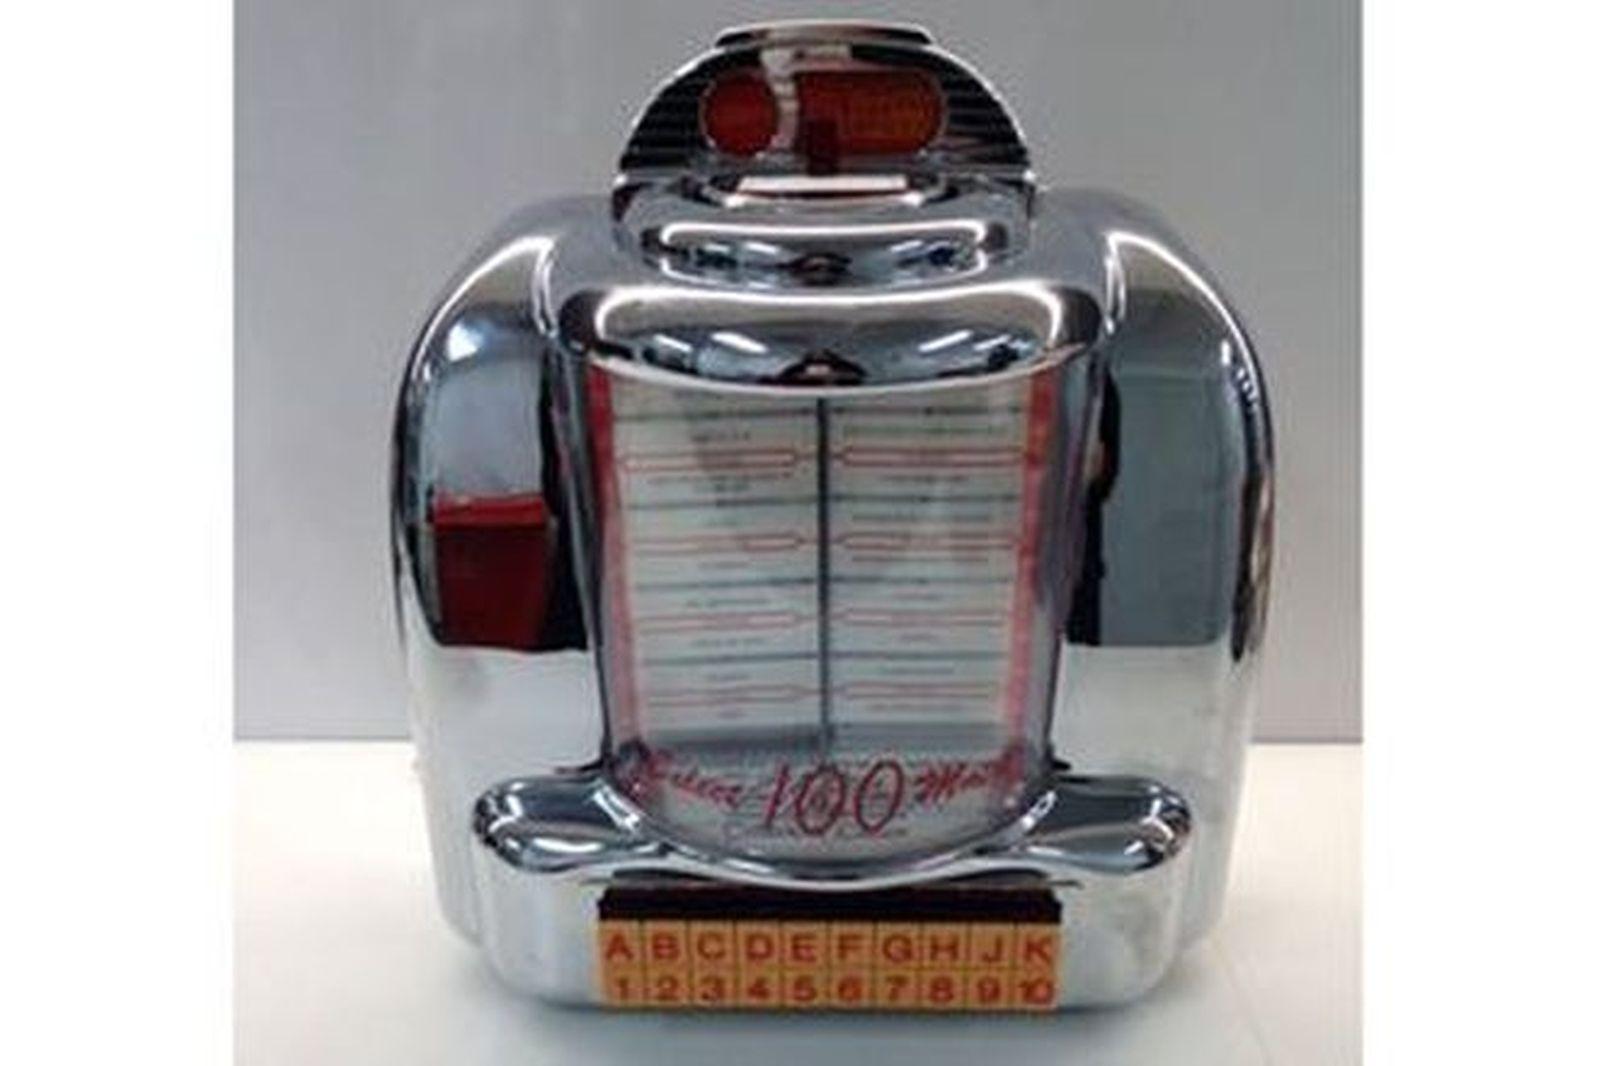 DINER JUKE BOX - RADIO CASSETTE WORKING